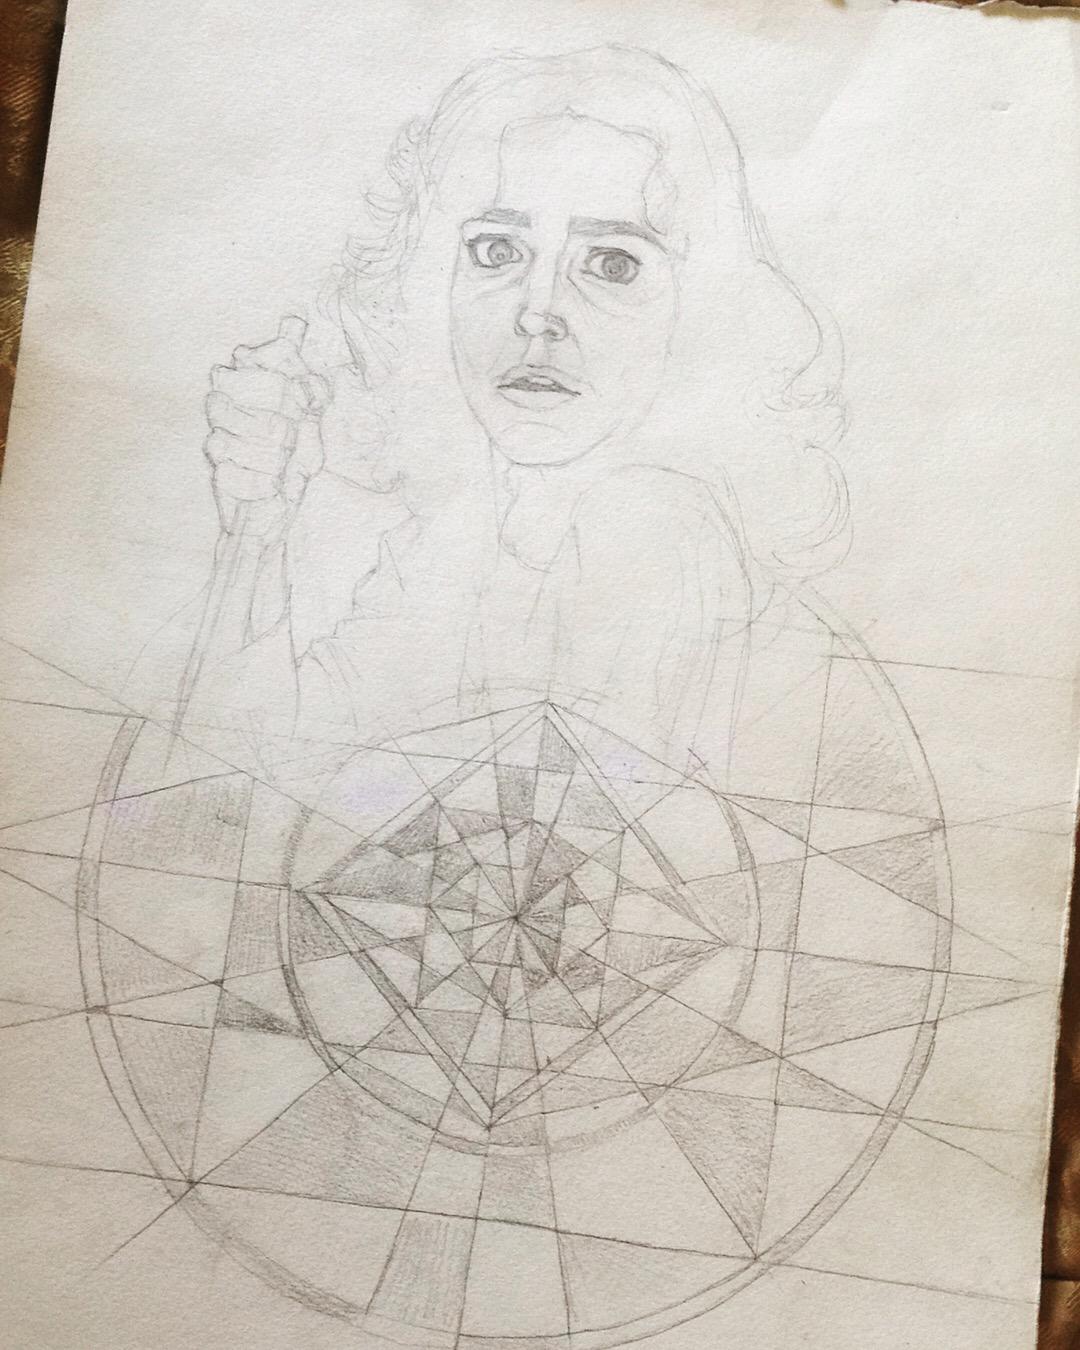 suspiria-sketch1.jpg